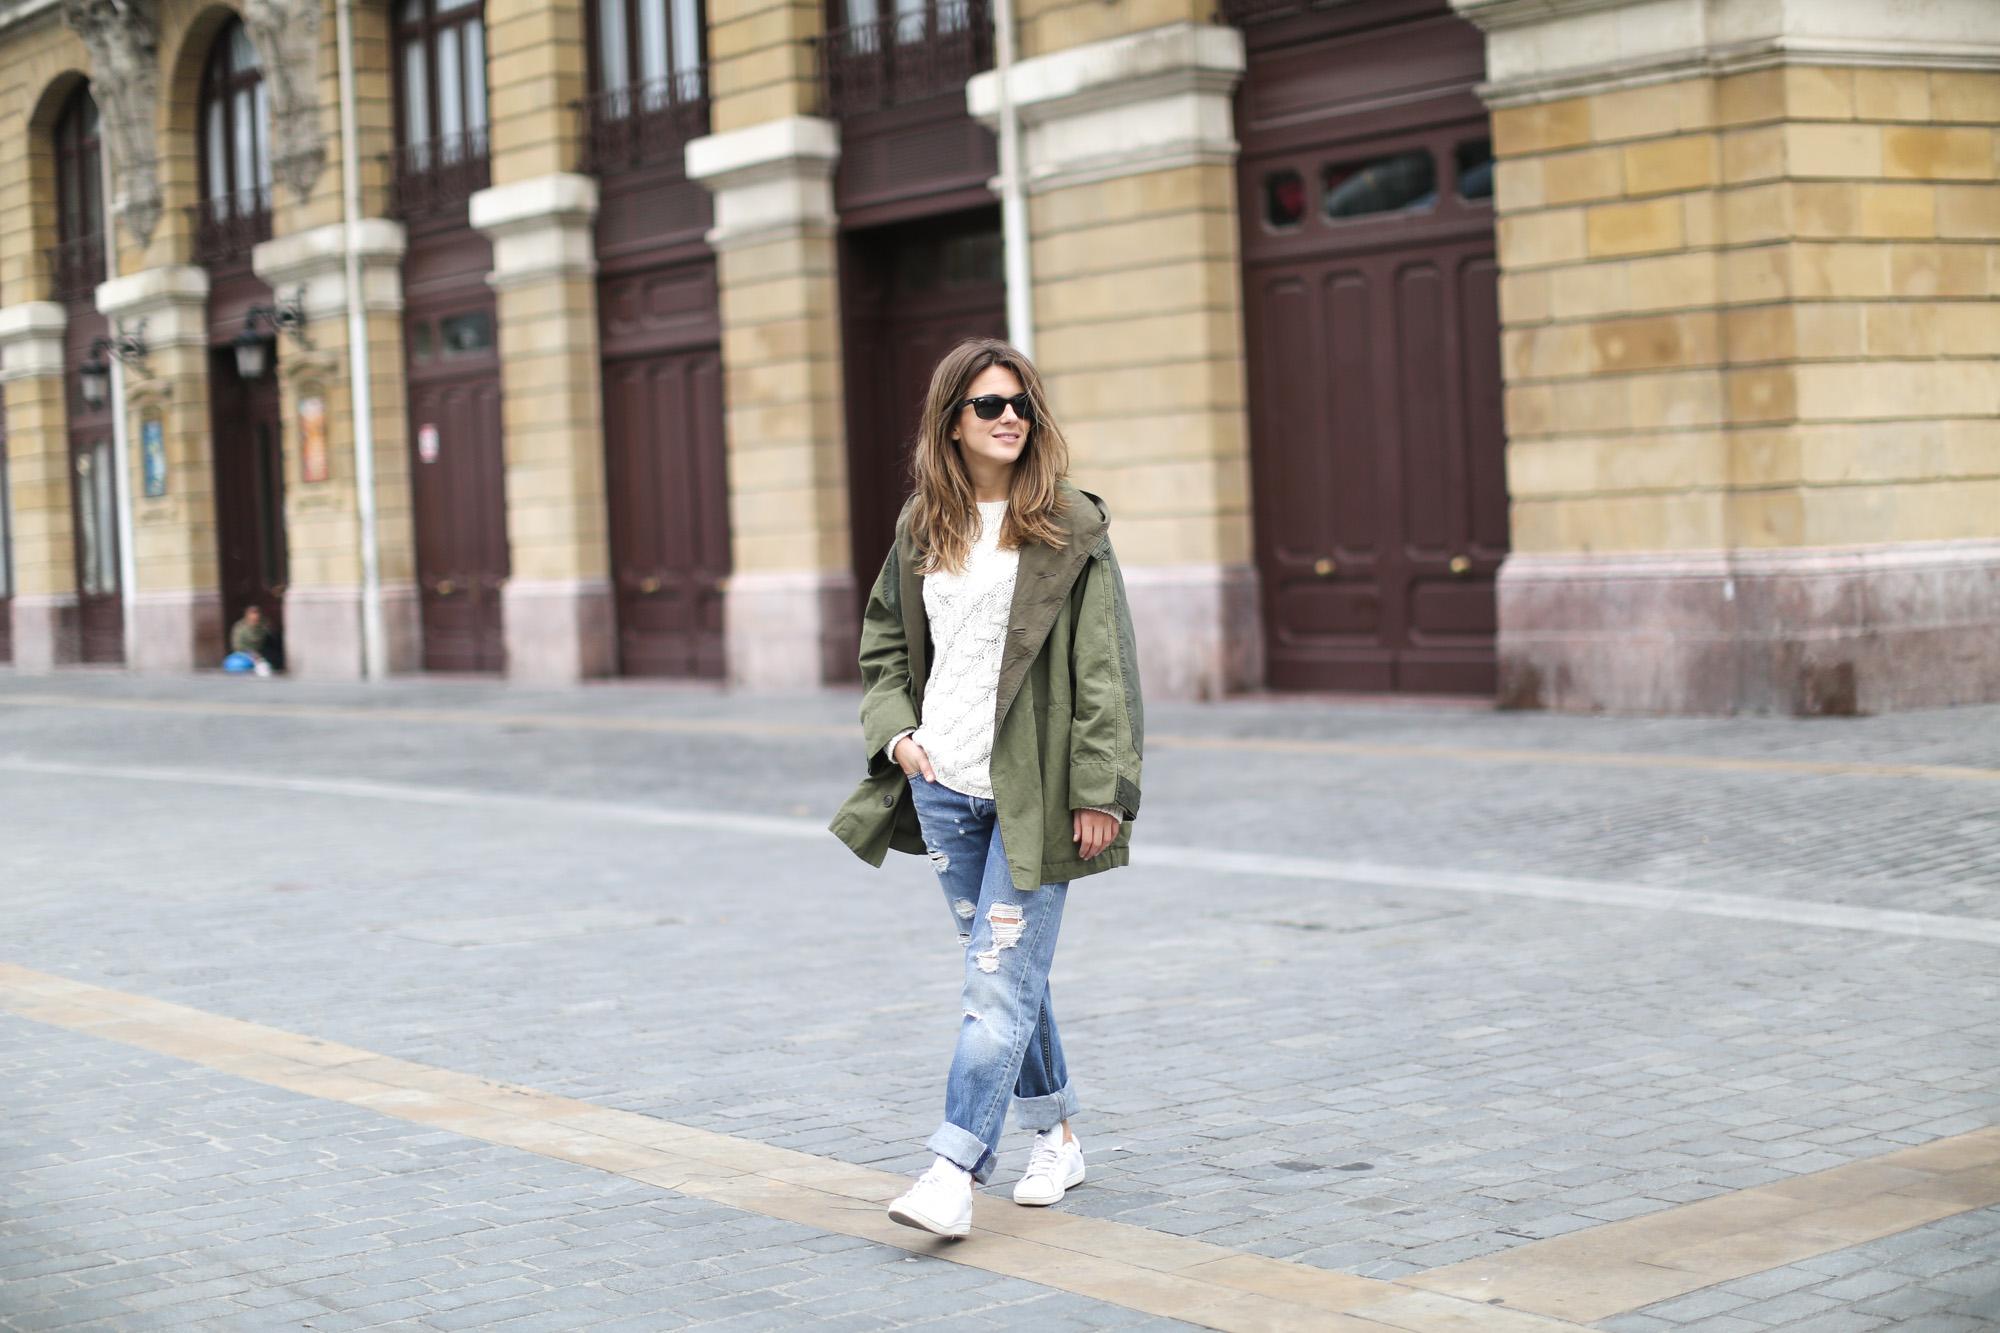 Clochet-streetstyle-isabel-marant-etoile-ellison-parka-acne-studios-jeans-adidas-stan-smith-4